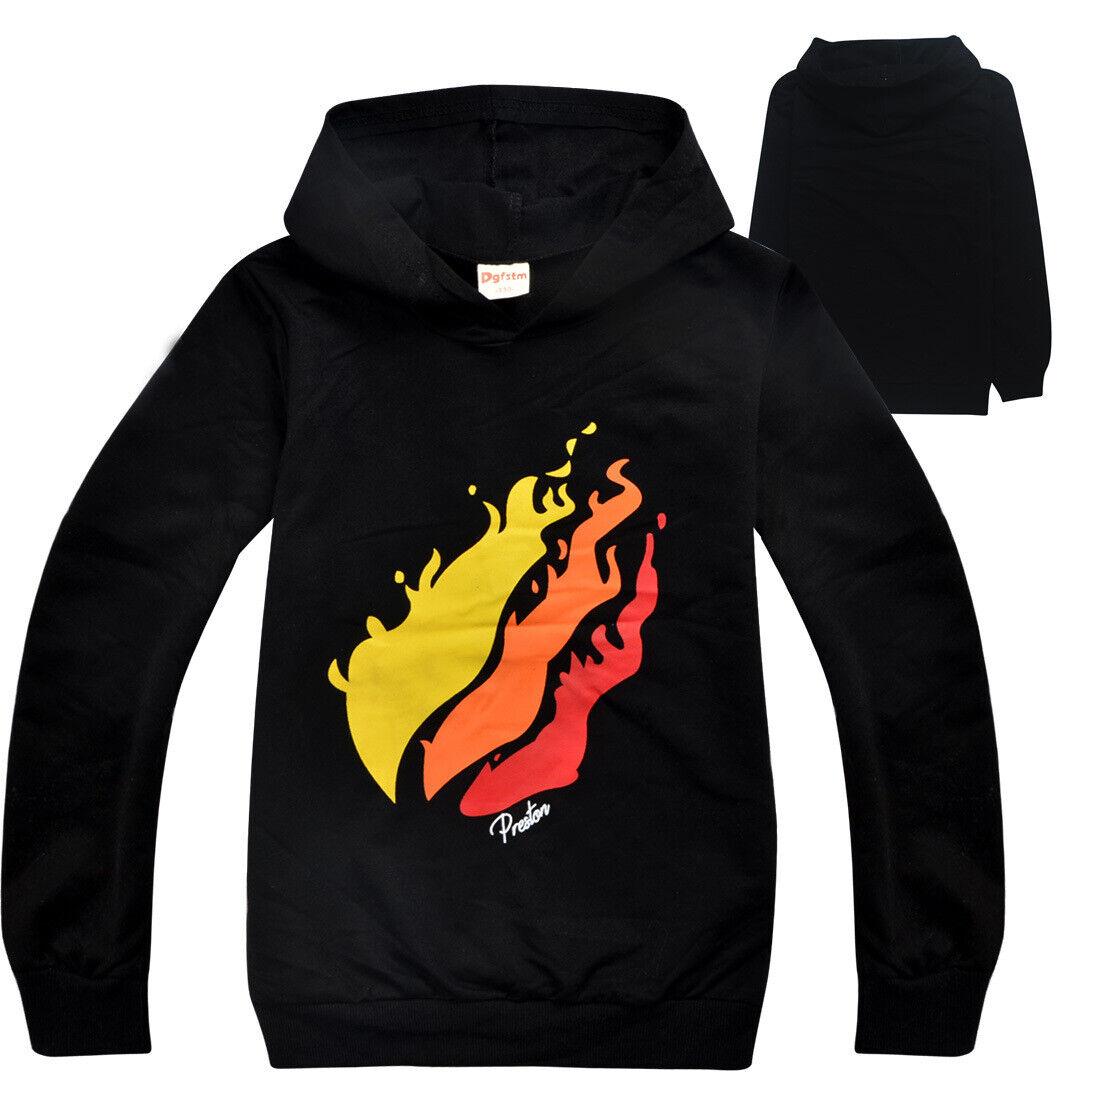 2019 new Prestonplayz children boy long-sleeved hoodies swea